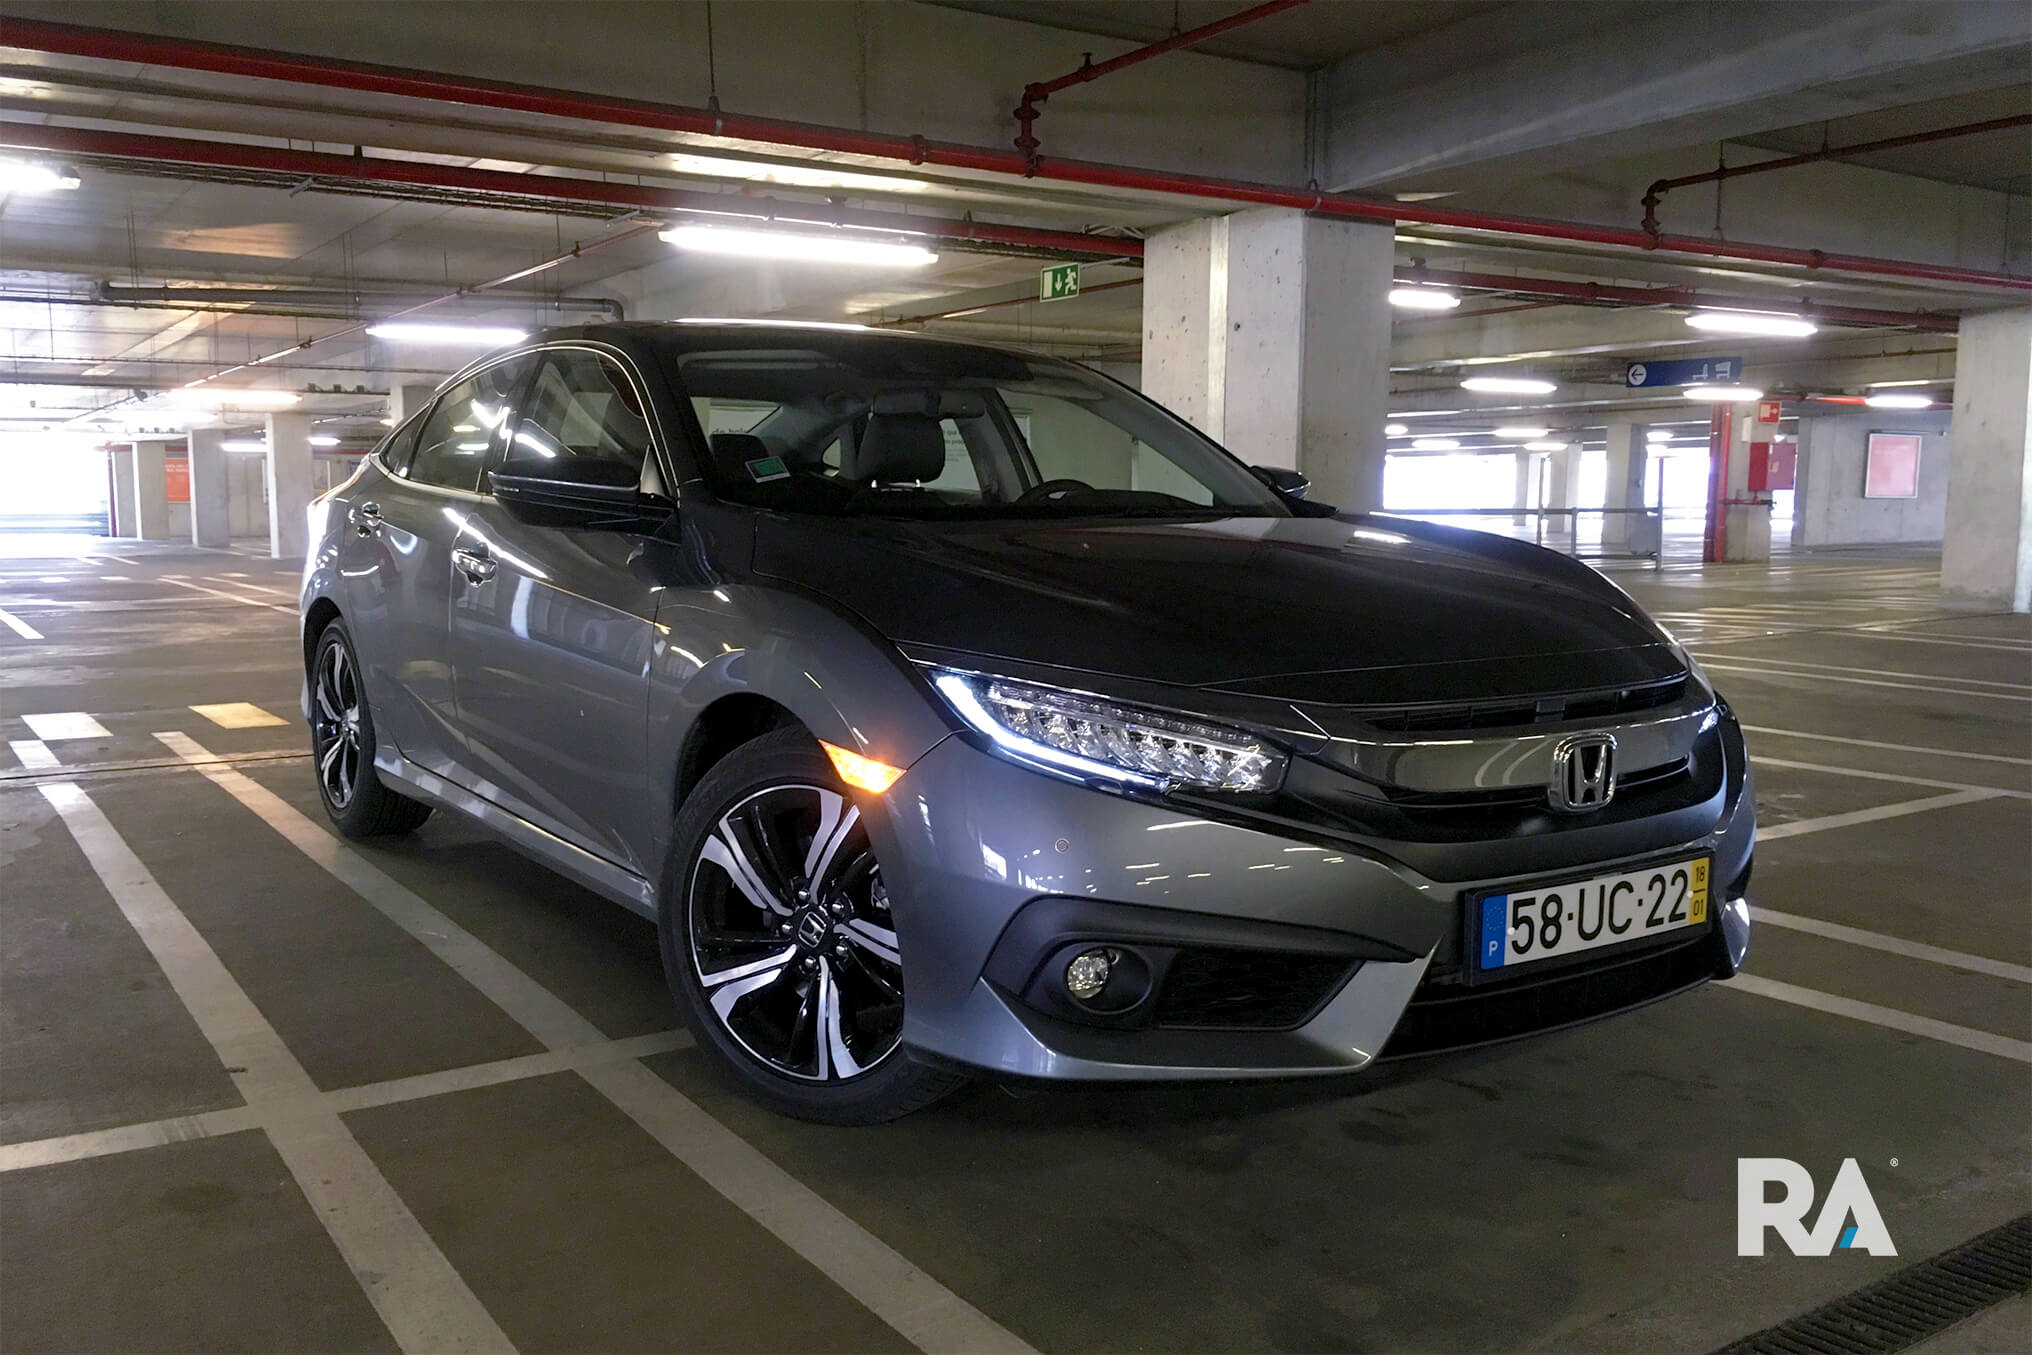 Honda Civic Sedan 1.5 i-VTEC Turbo Executive